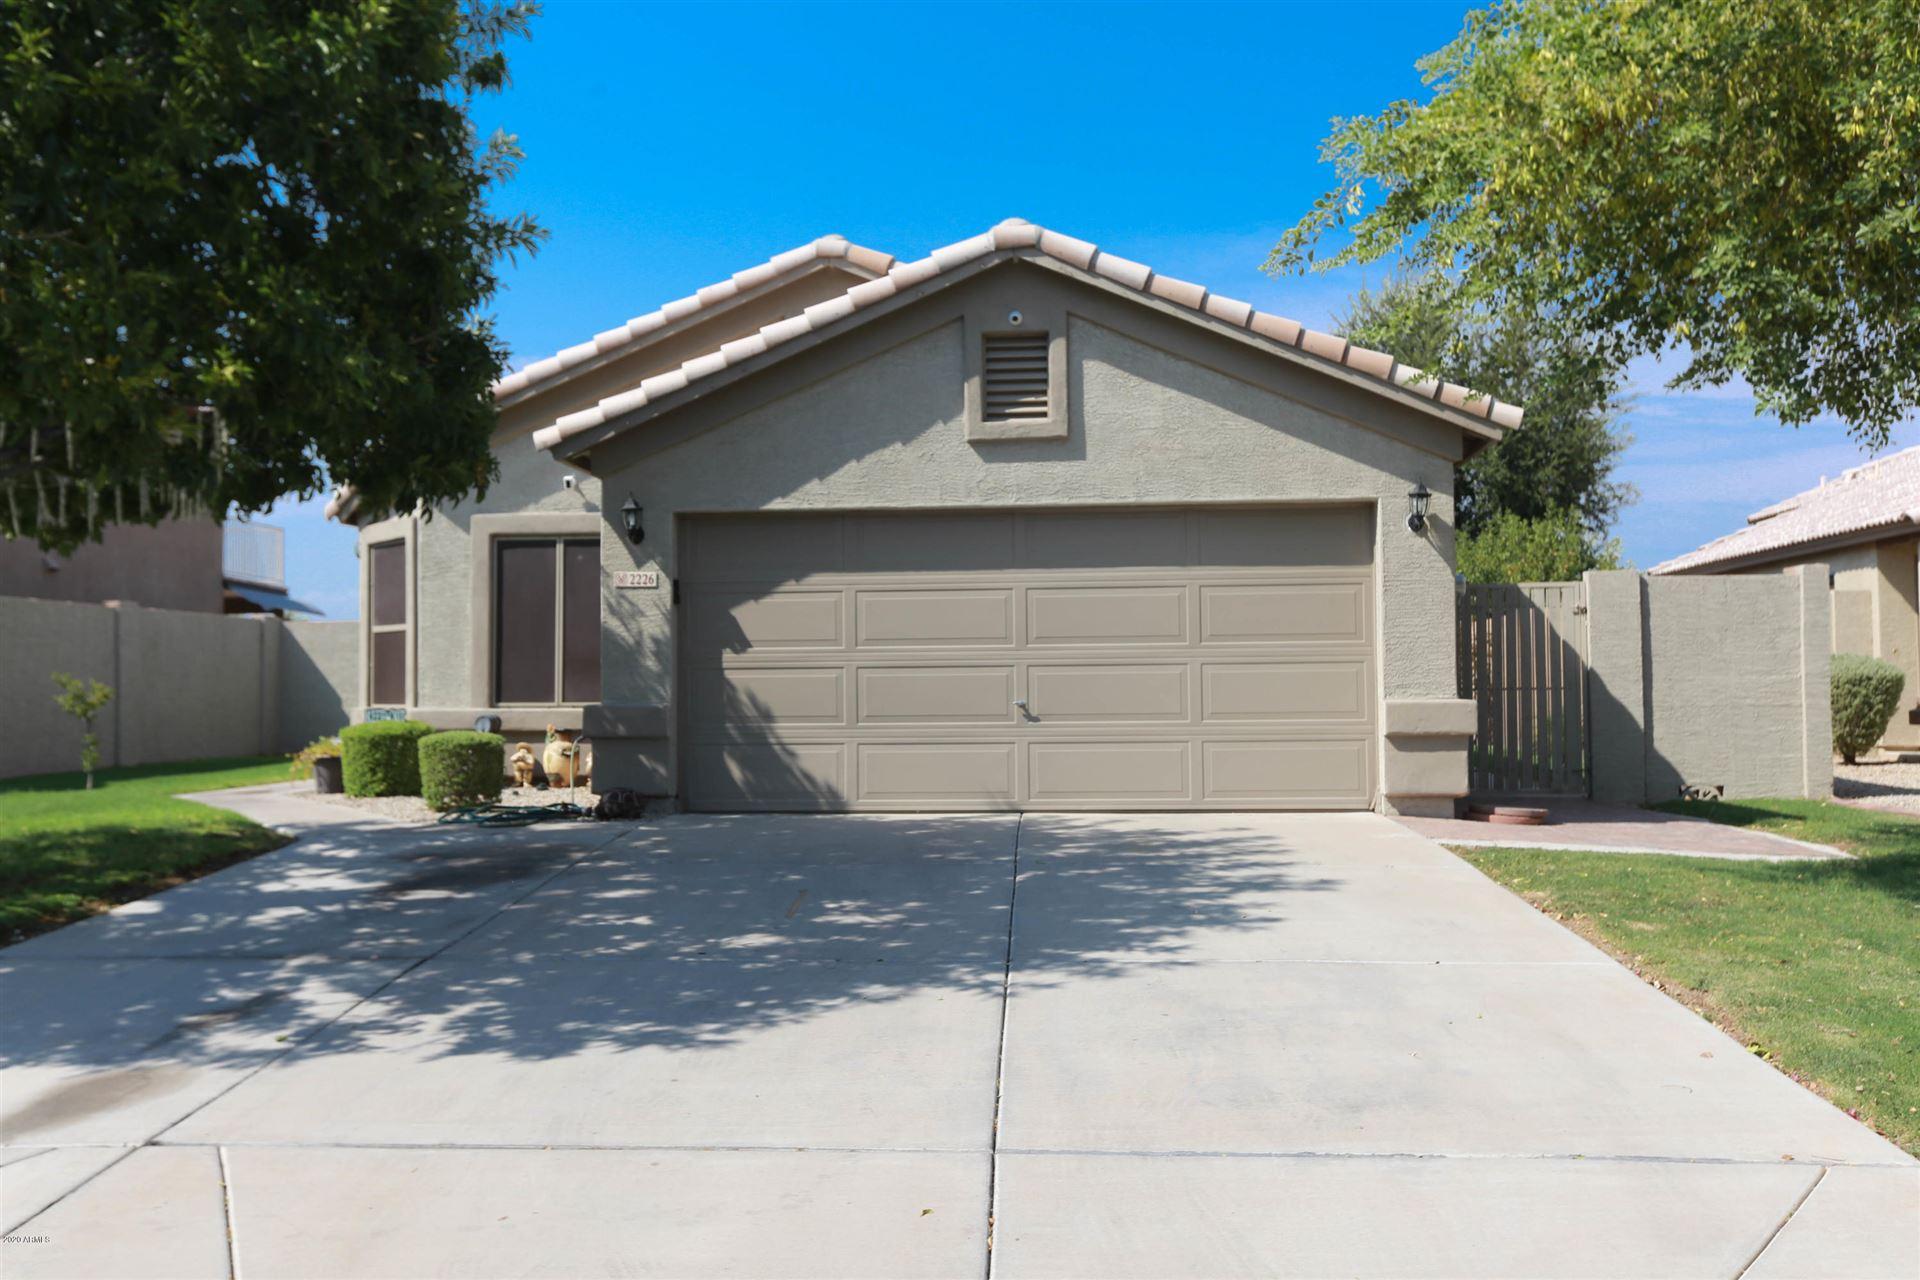 2226 W SAINT CATHERINE Avenue, Phoenix, AZ 85041 - MLS#: 6120449